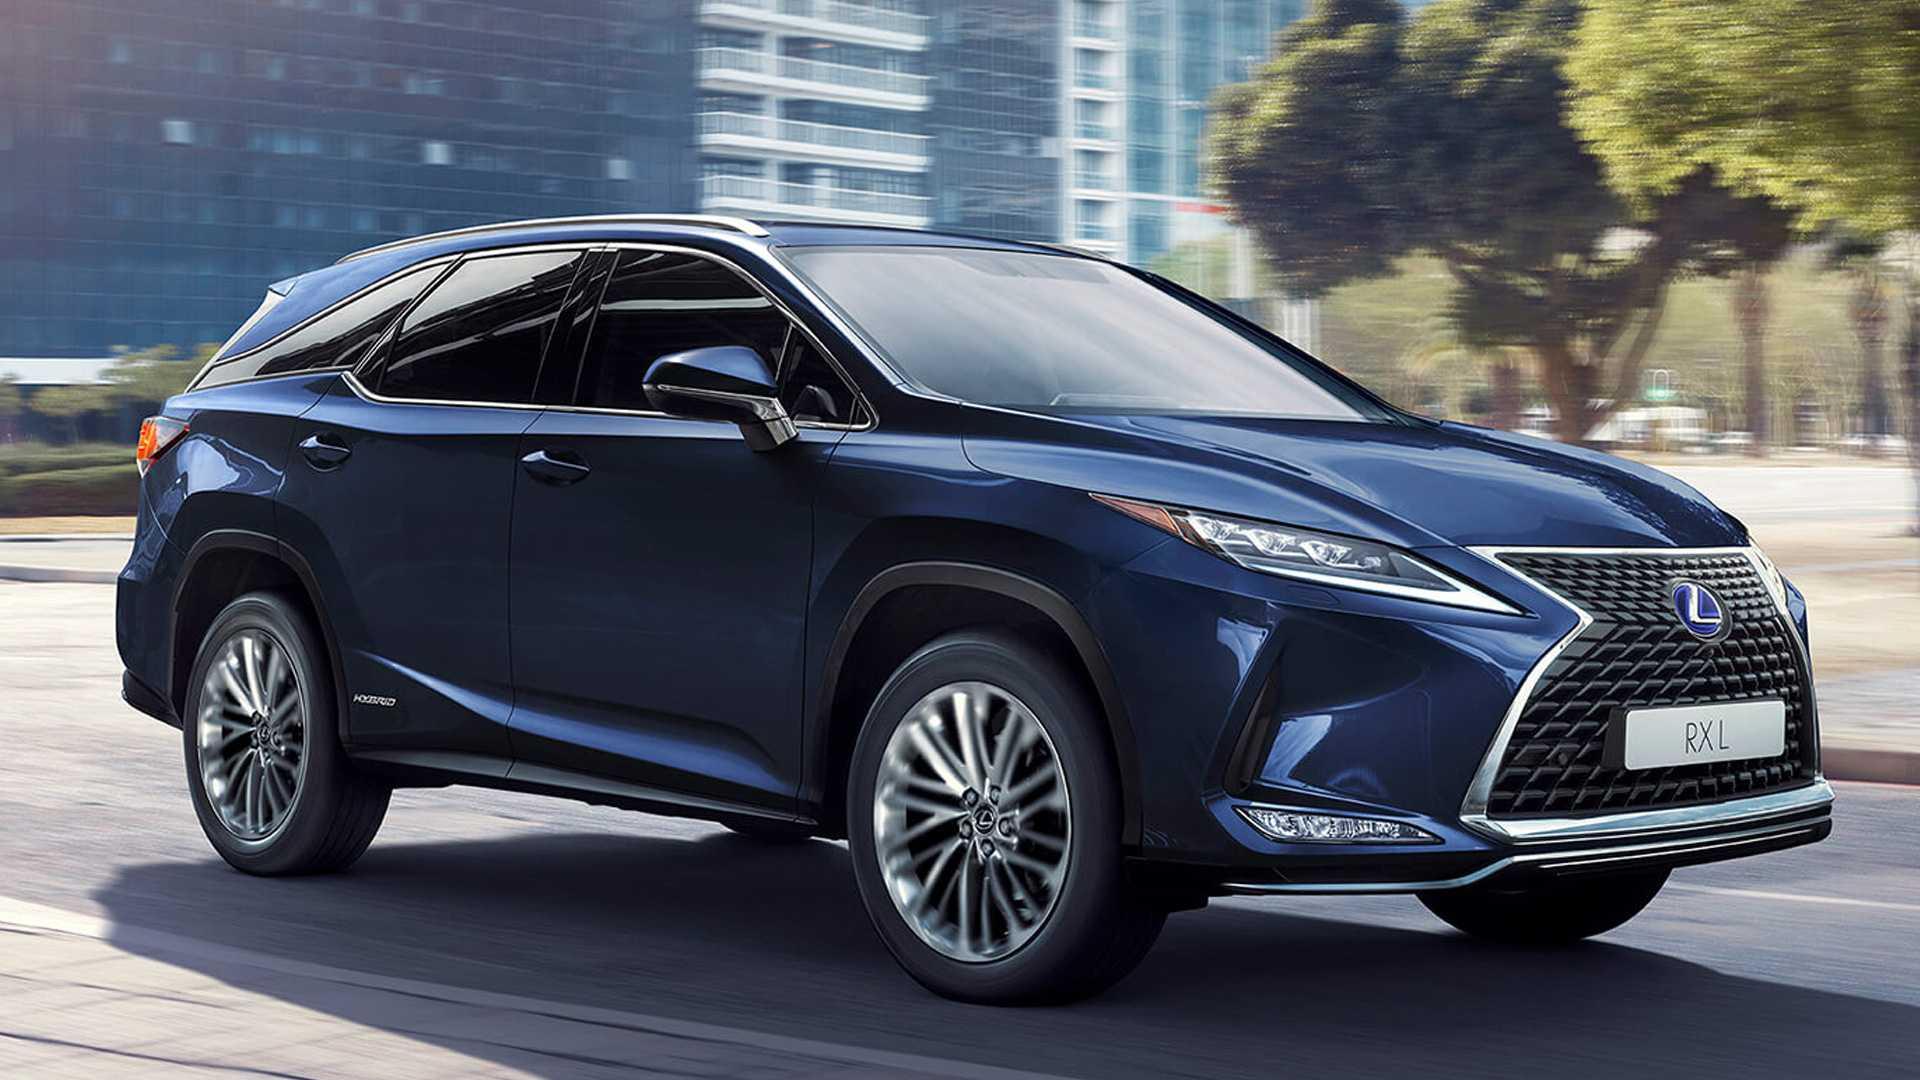 Lexus rx 450h гибрид - все о нем за 5 минут! характеристики обзор